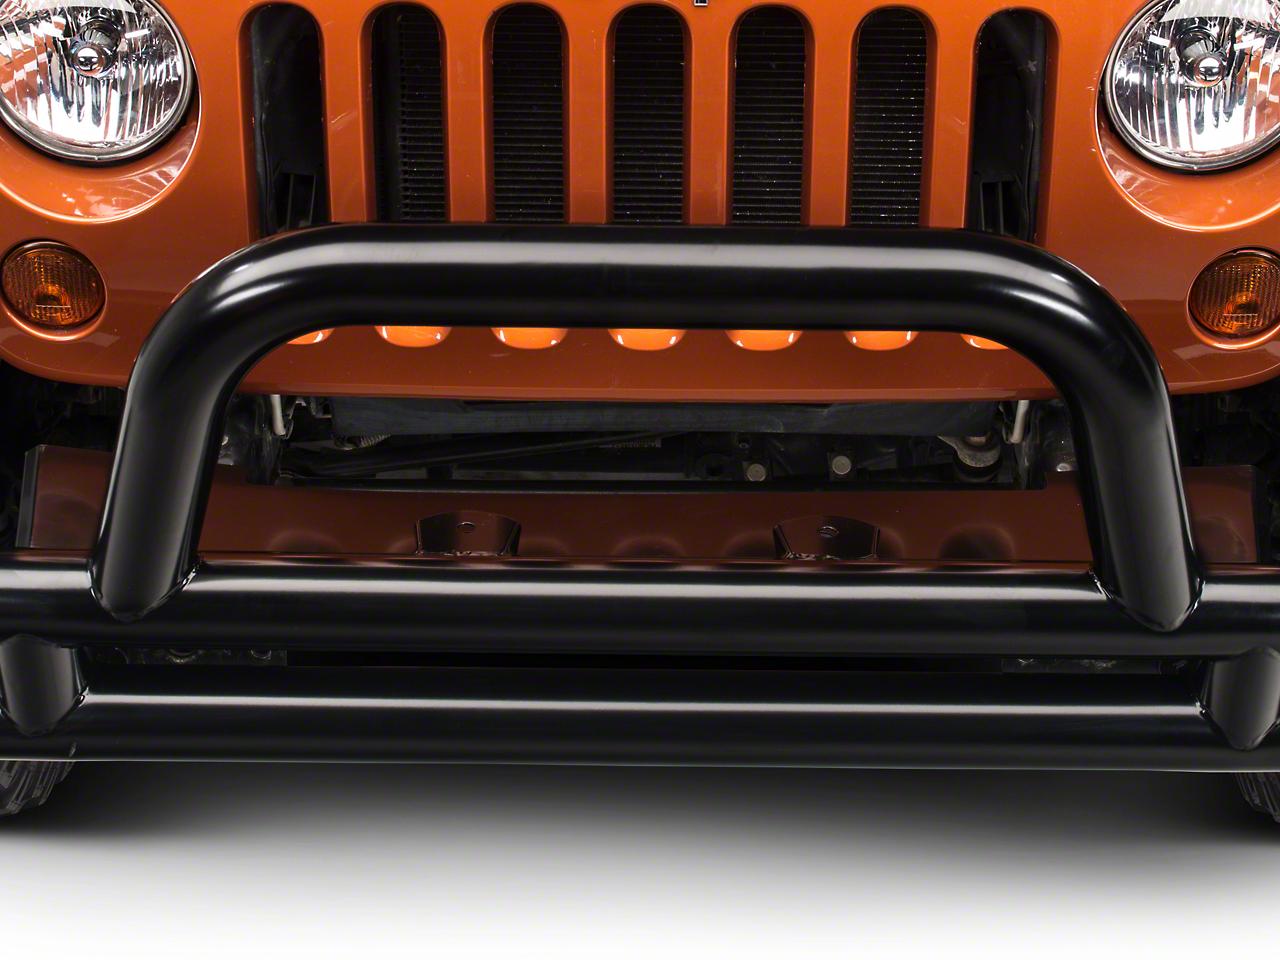 RedRock 4x4 Front Fill Plate - Gloss Black (07-17 Wrangler JK)